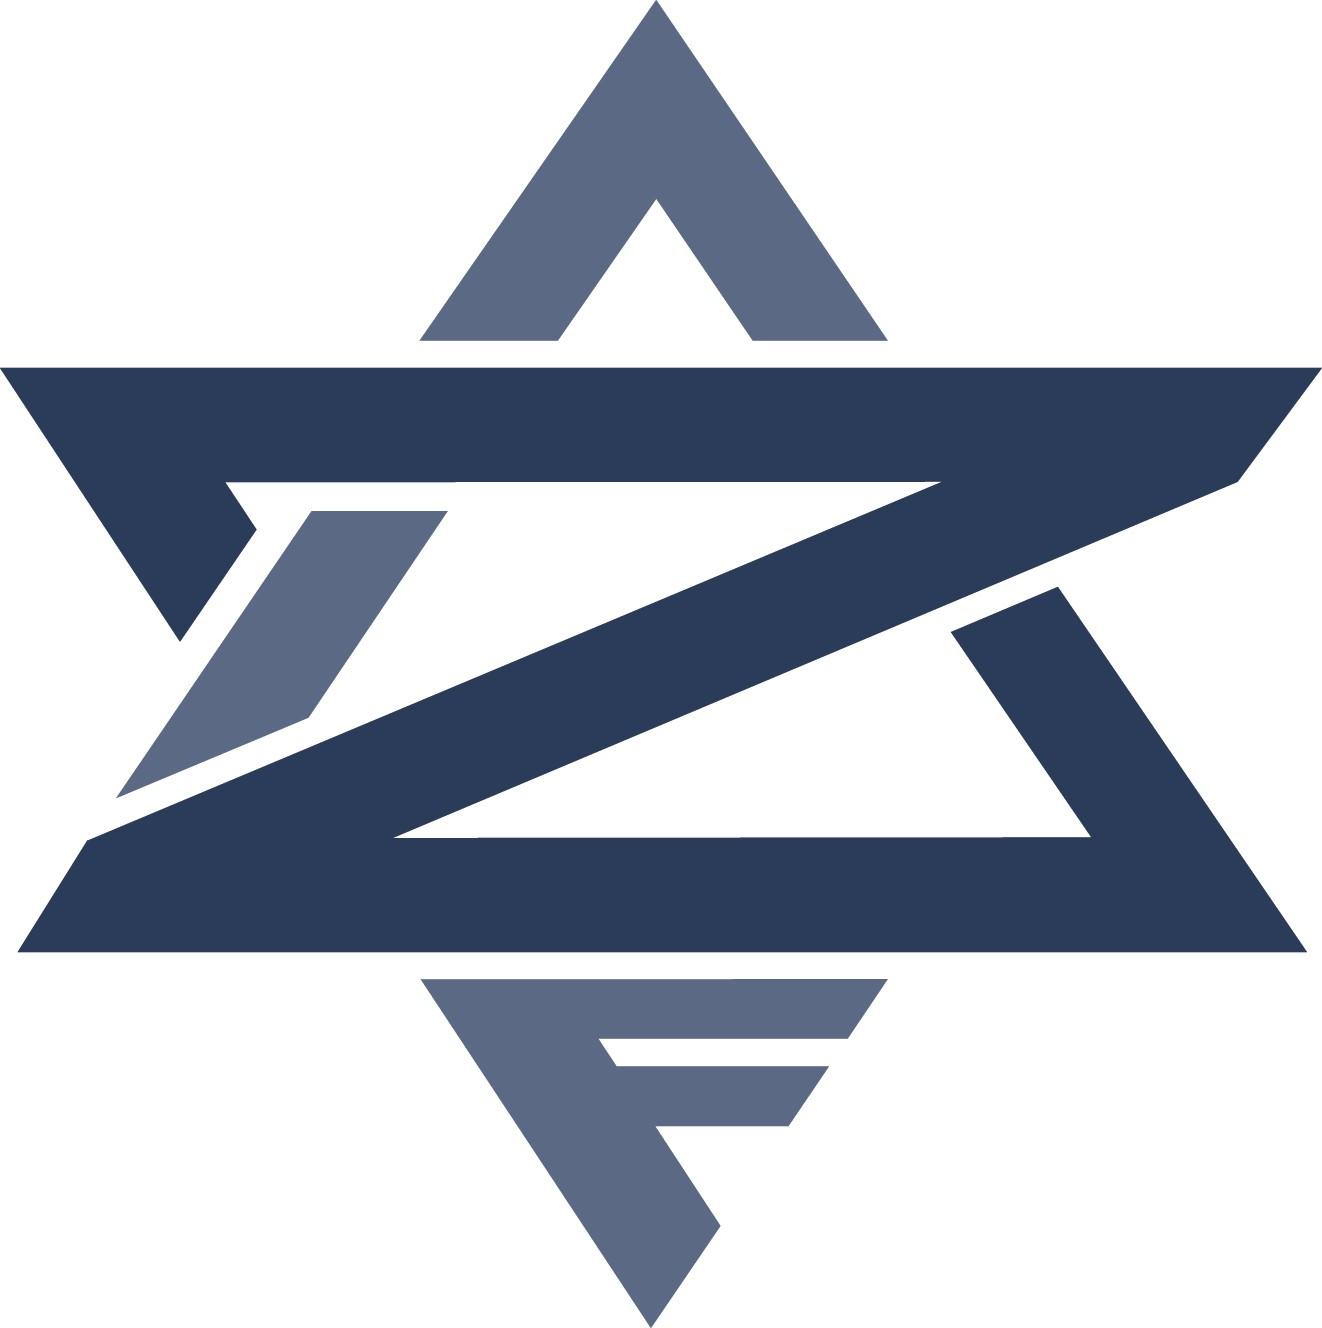 http://ljla.org.au/wp-content/uploads/2013/05/ZFA-Symbol-Only-Colour.jpg